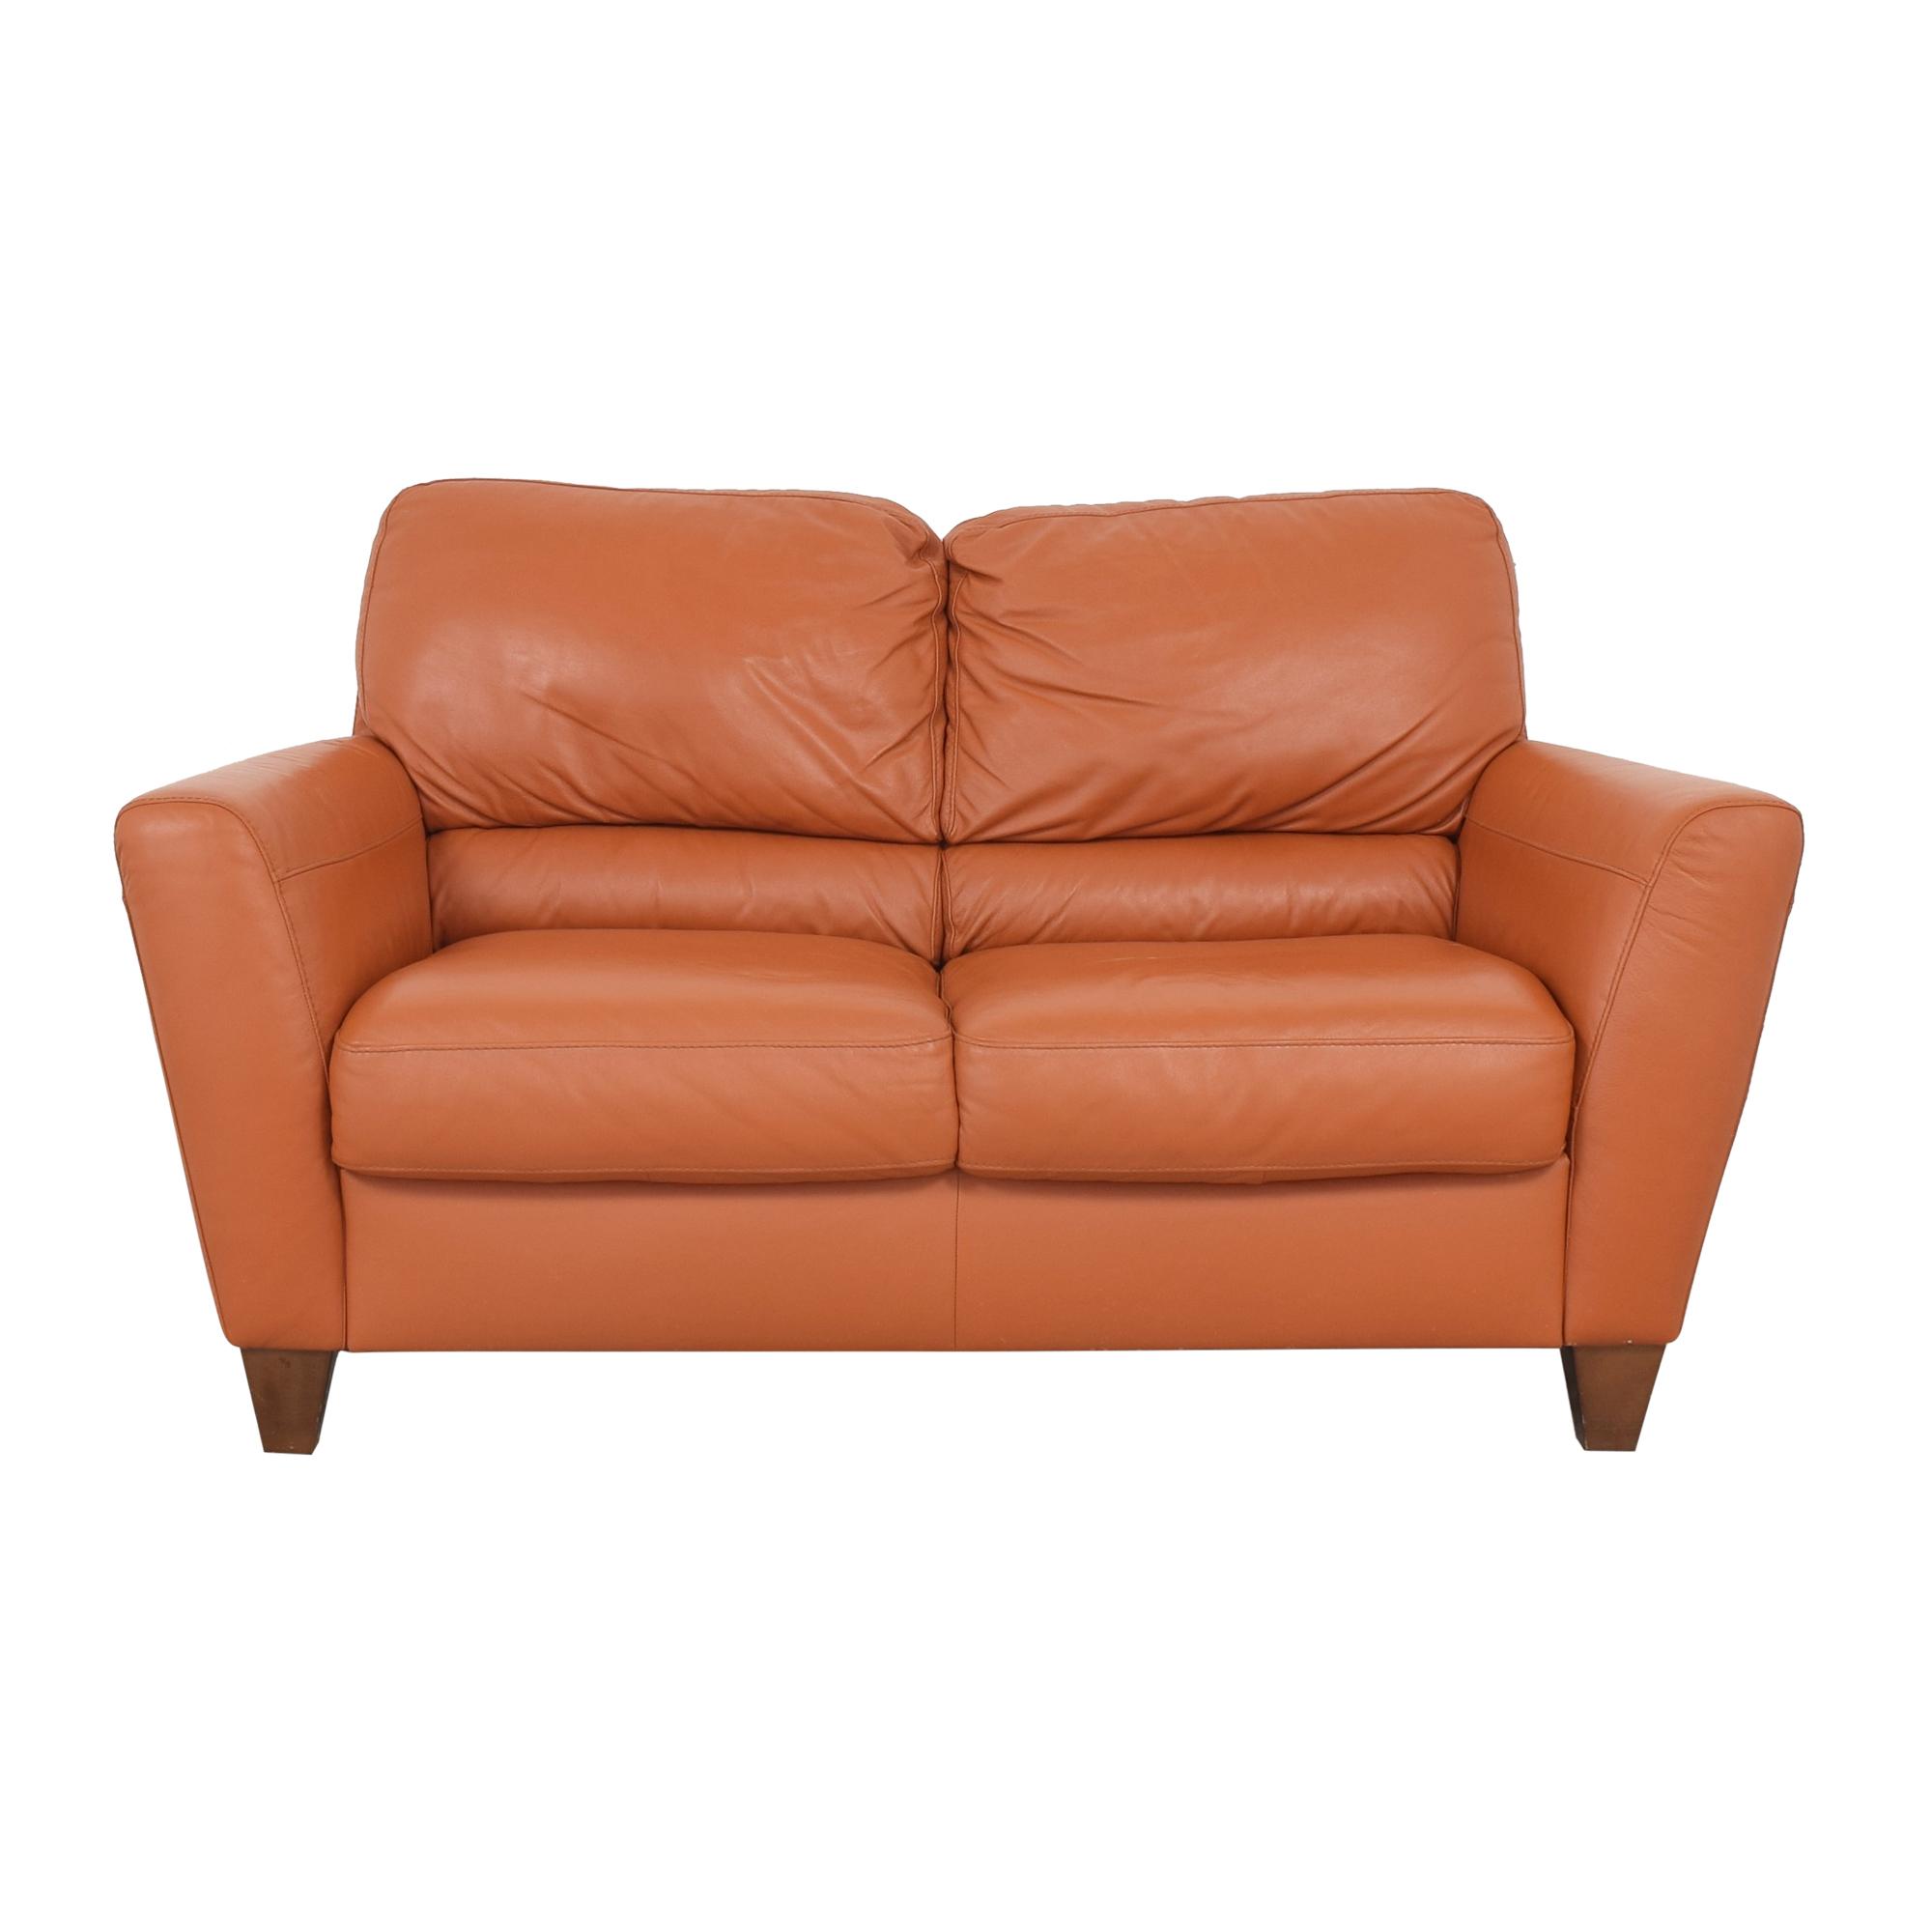 Two Cushion Loveseat / Sofas